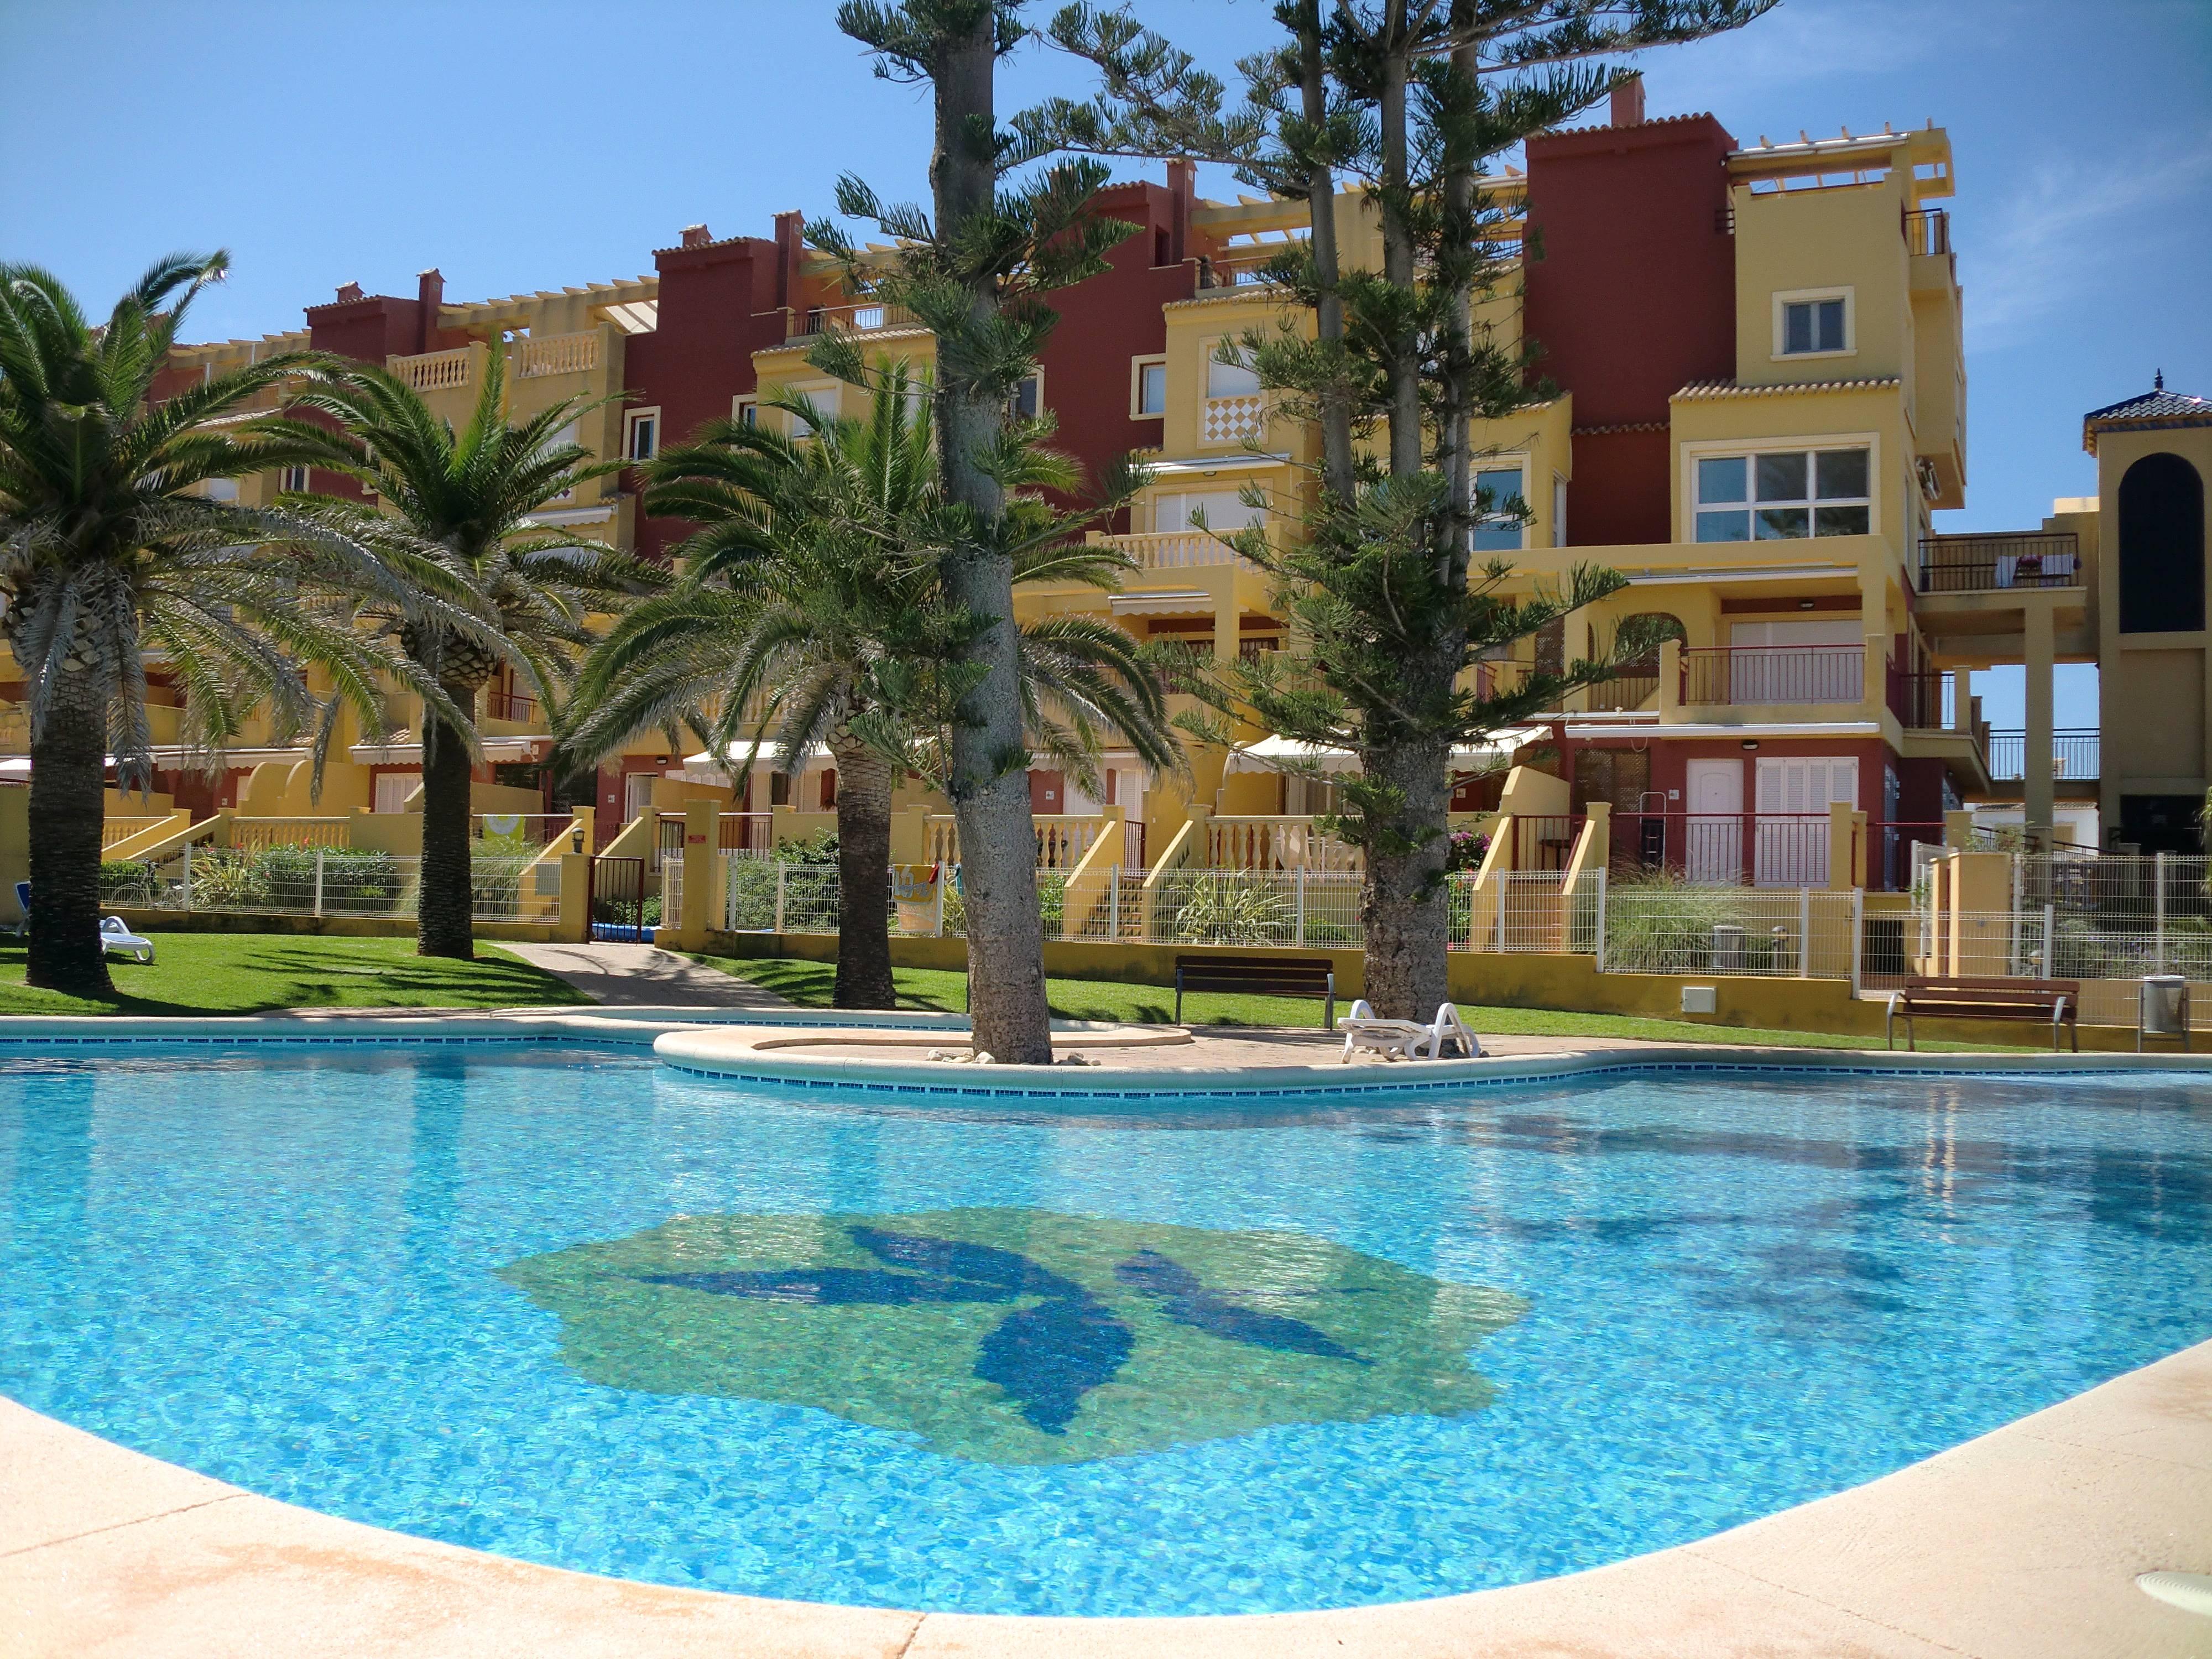 Apartamento en alquiler a pie de playa d nia alicante costa blanca - Denia apartamentos alquiler ...